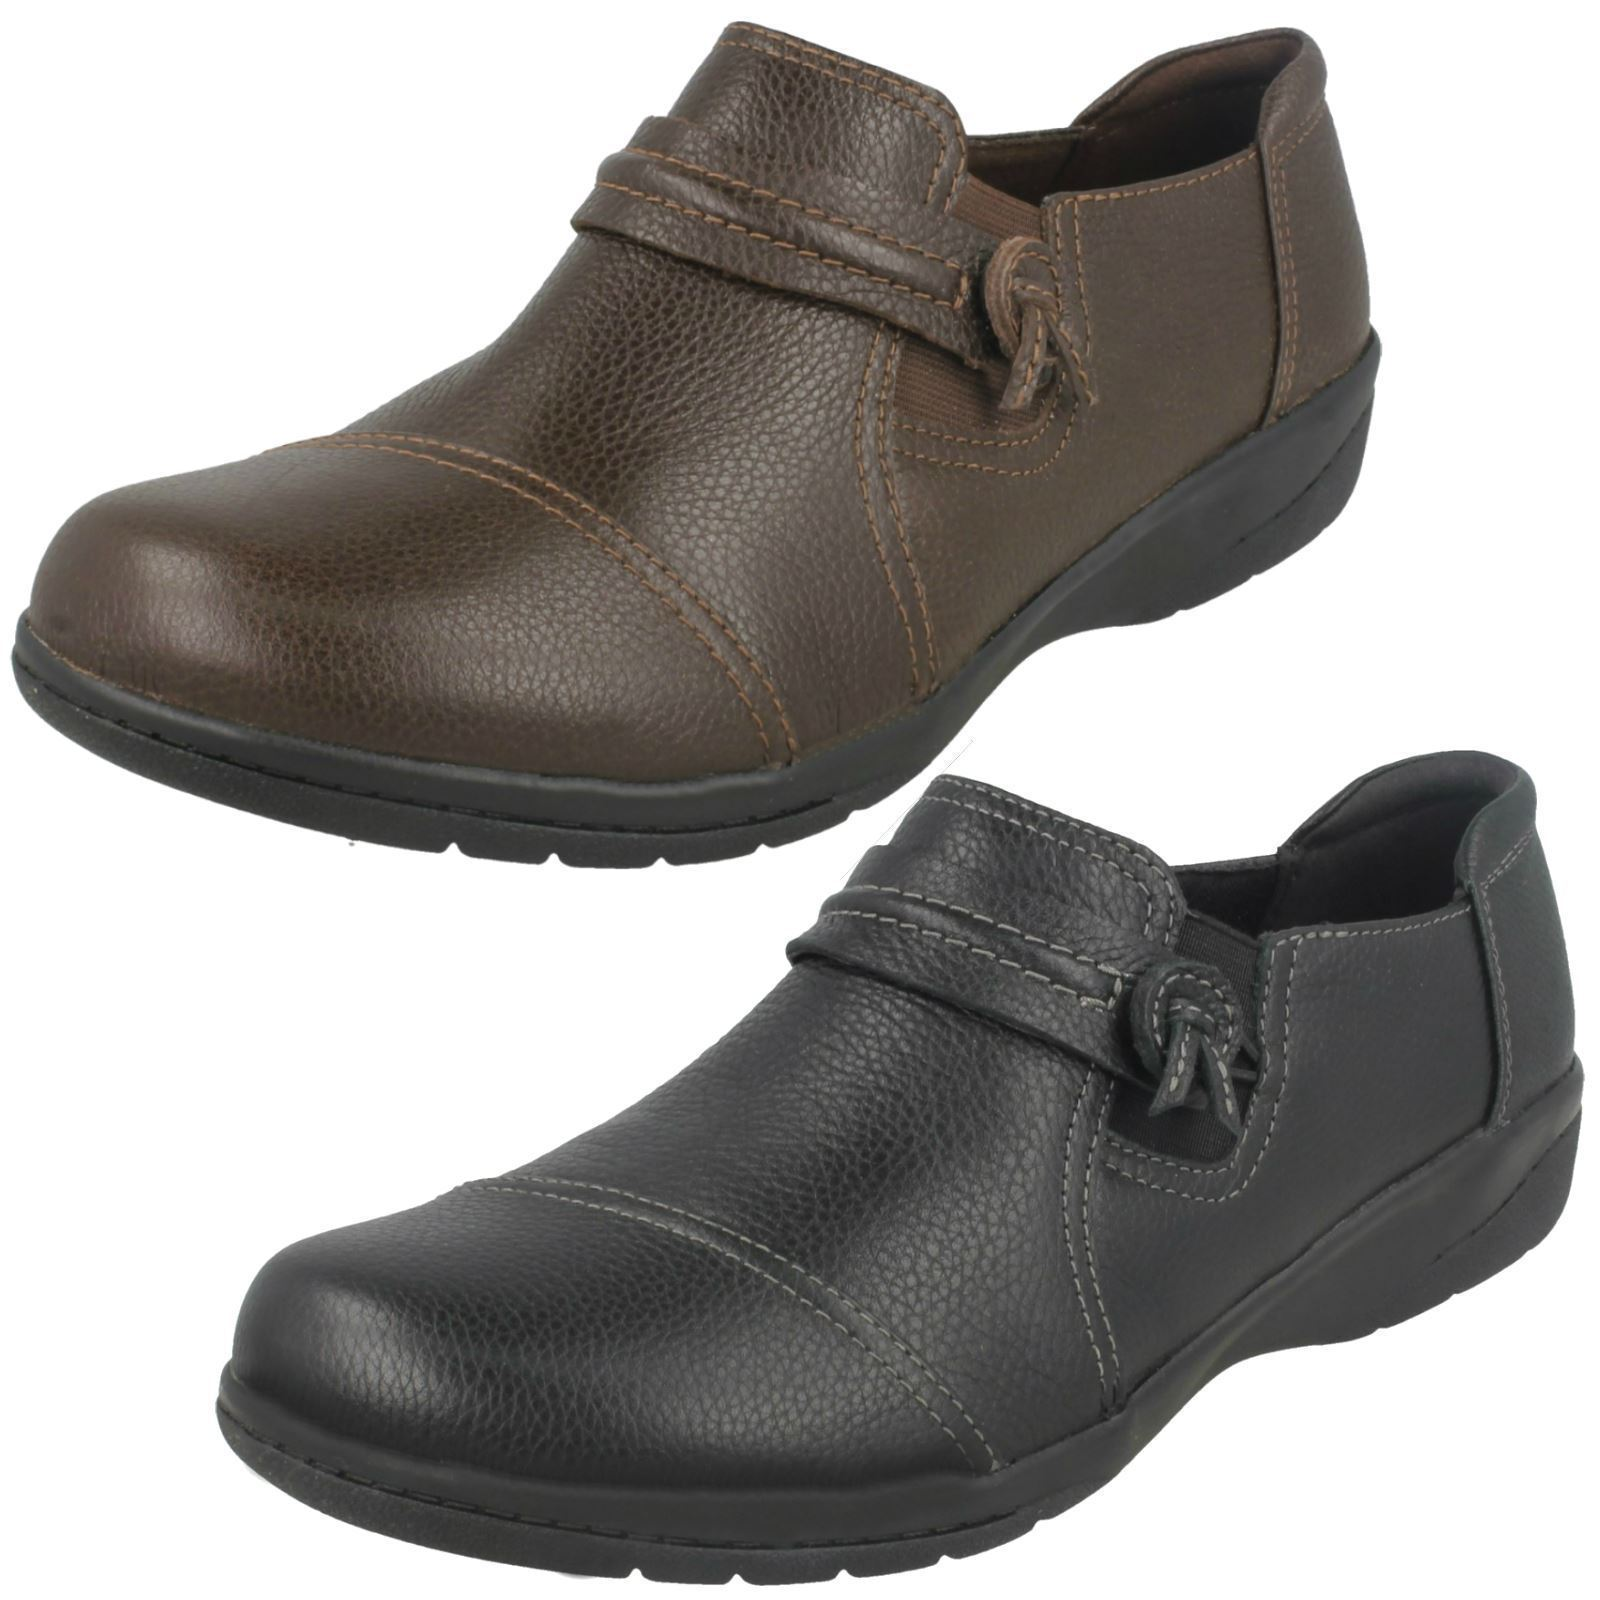 Damen schwarzes Leder Clarks Klug Freizeit Schuhe Cheyn Madi E FBSSUNG